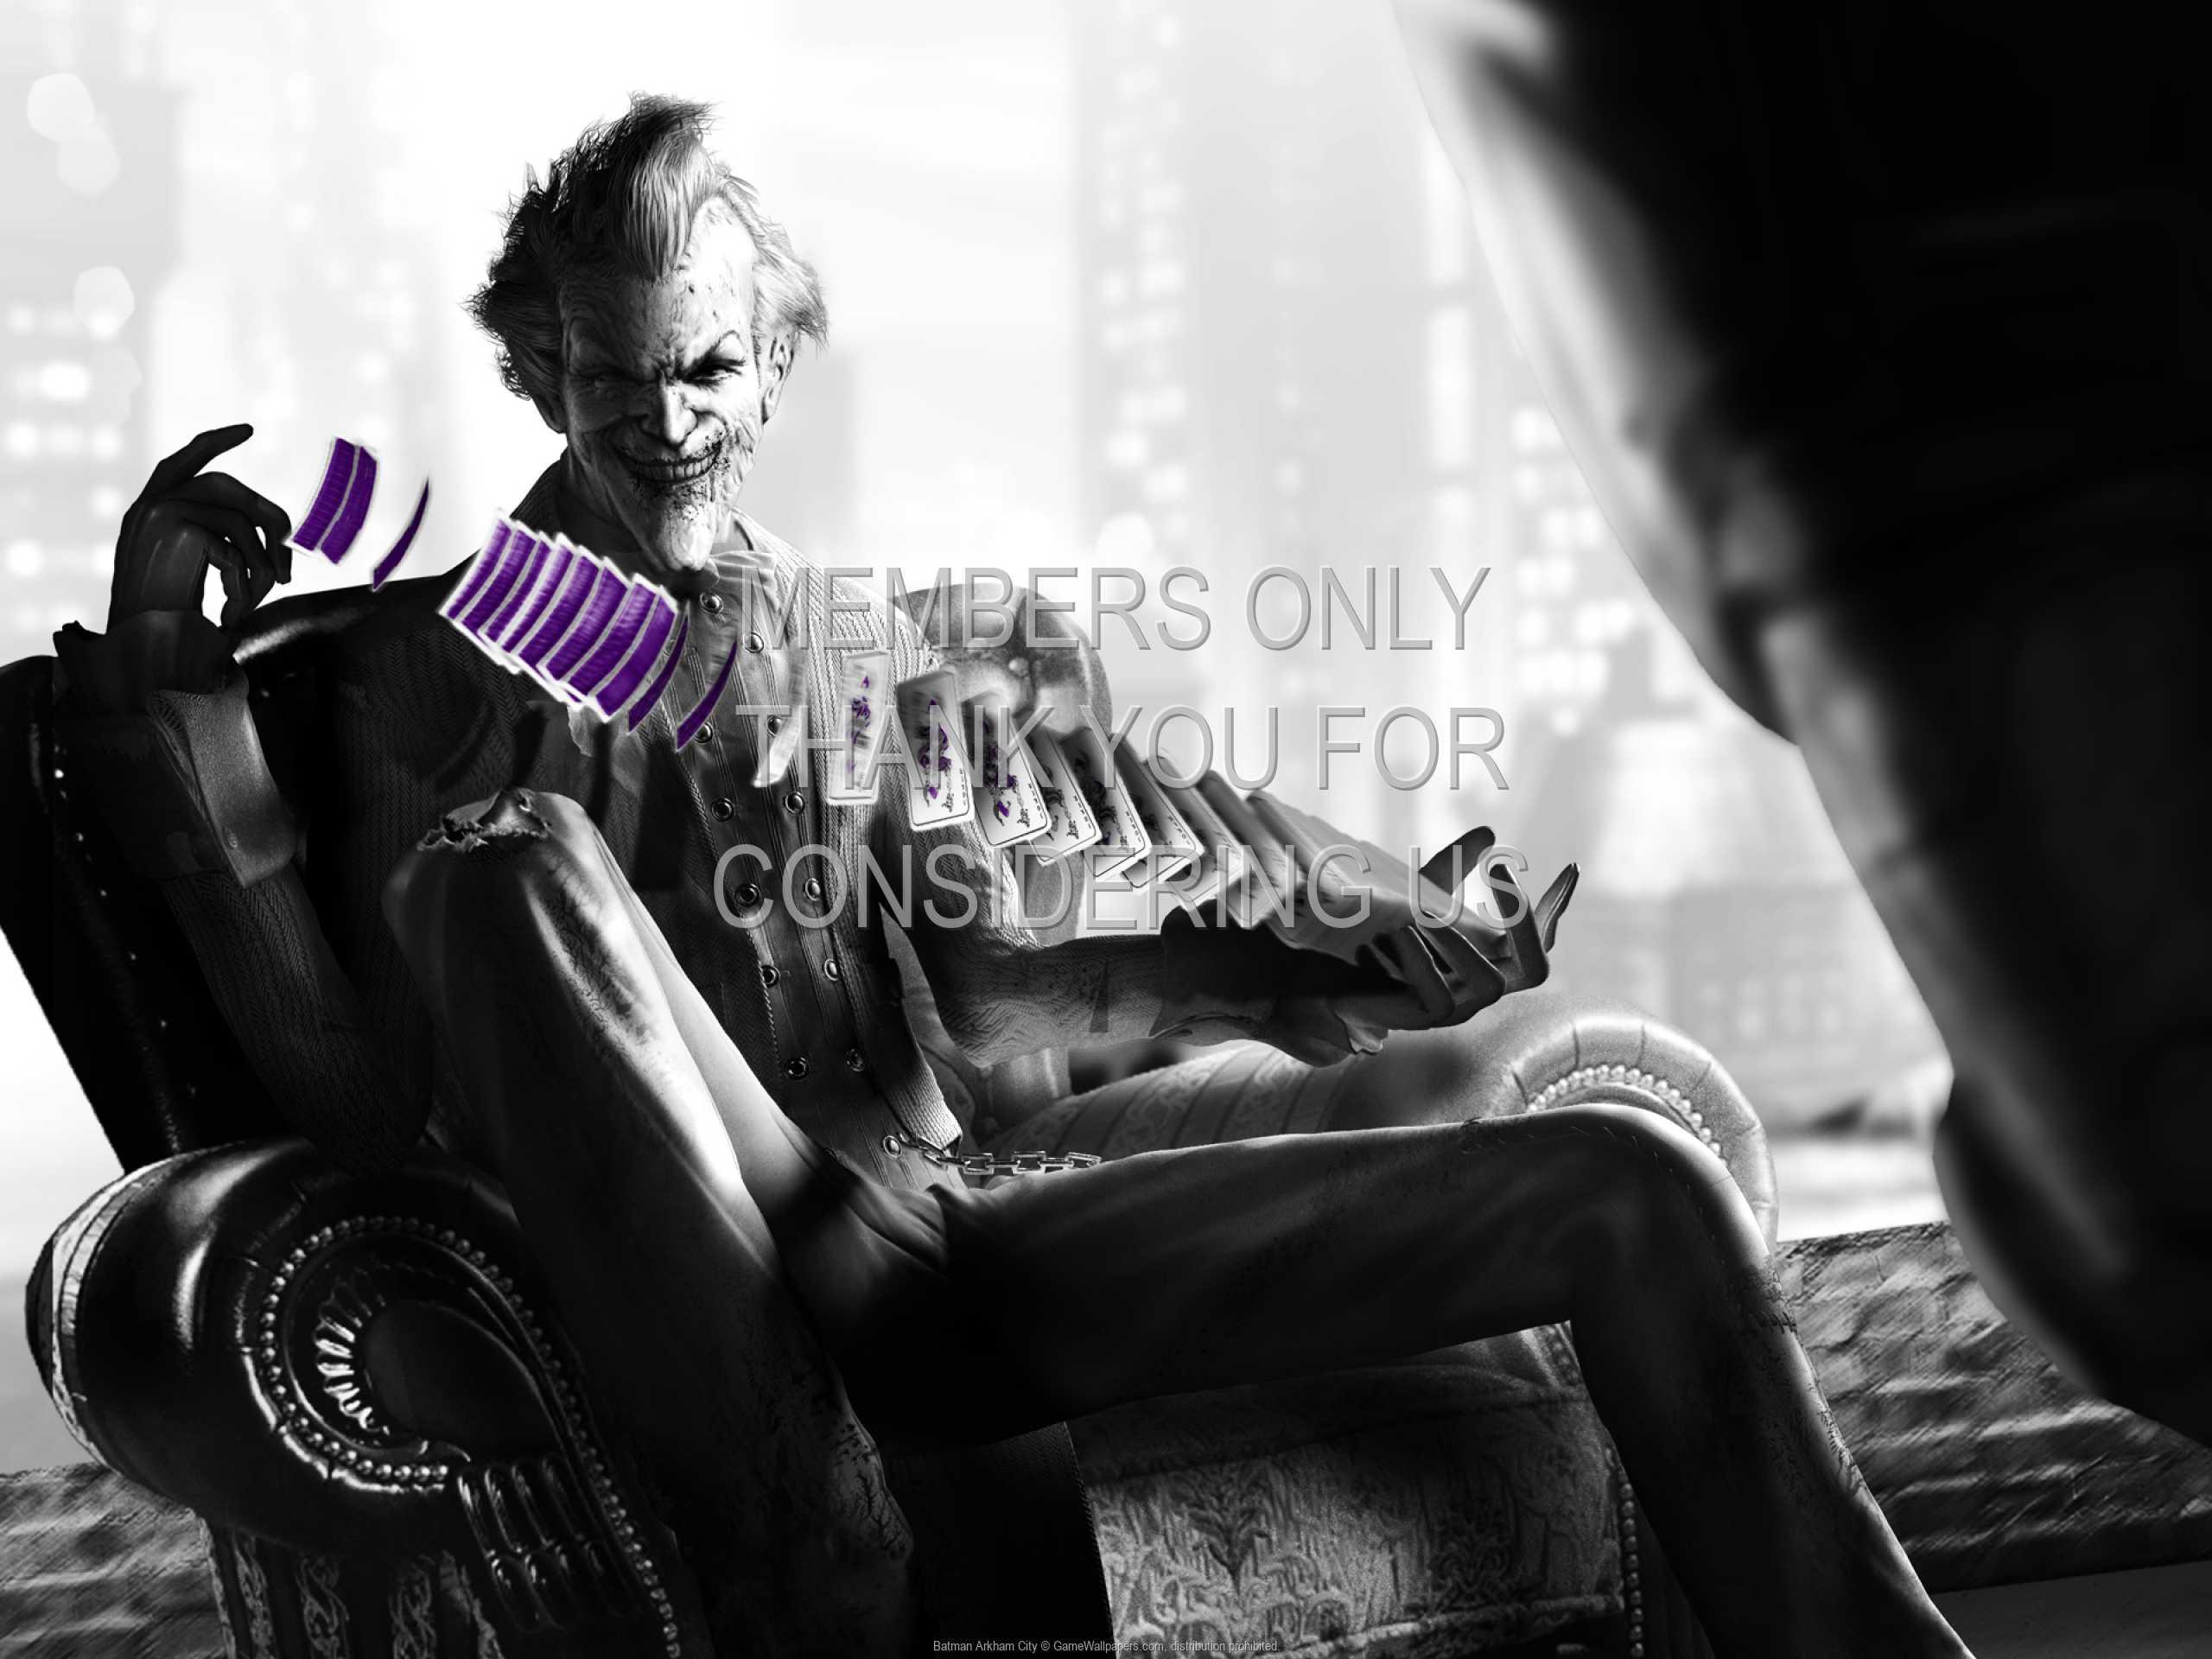 Batman: Arkham City 1080p Horizontal Mobile wallpaper or background 03